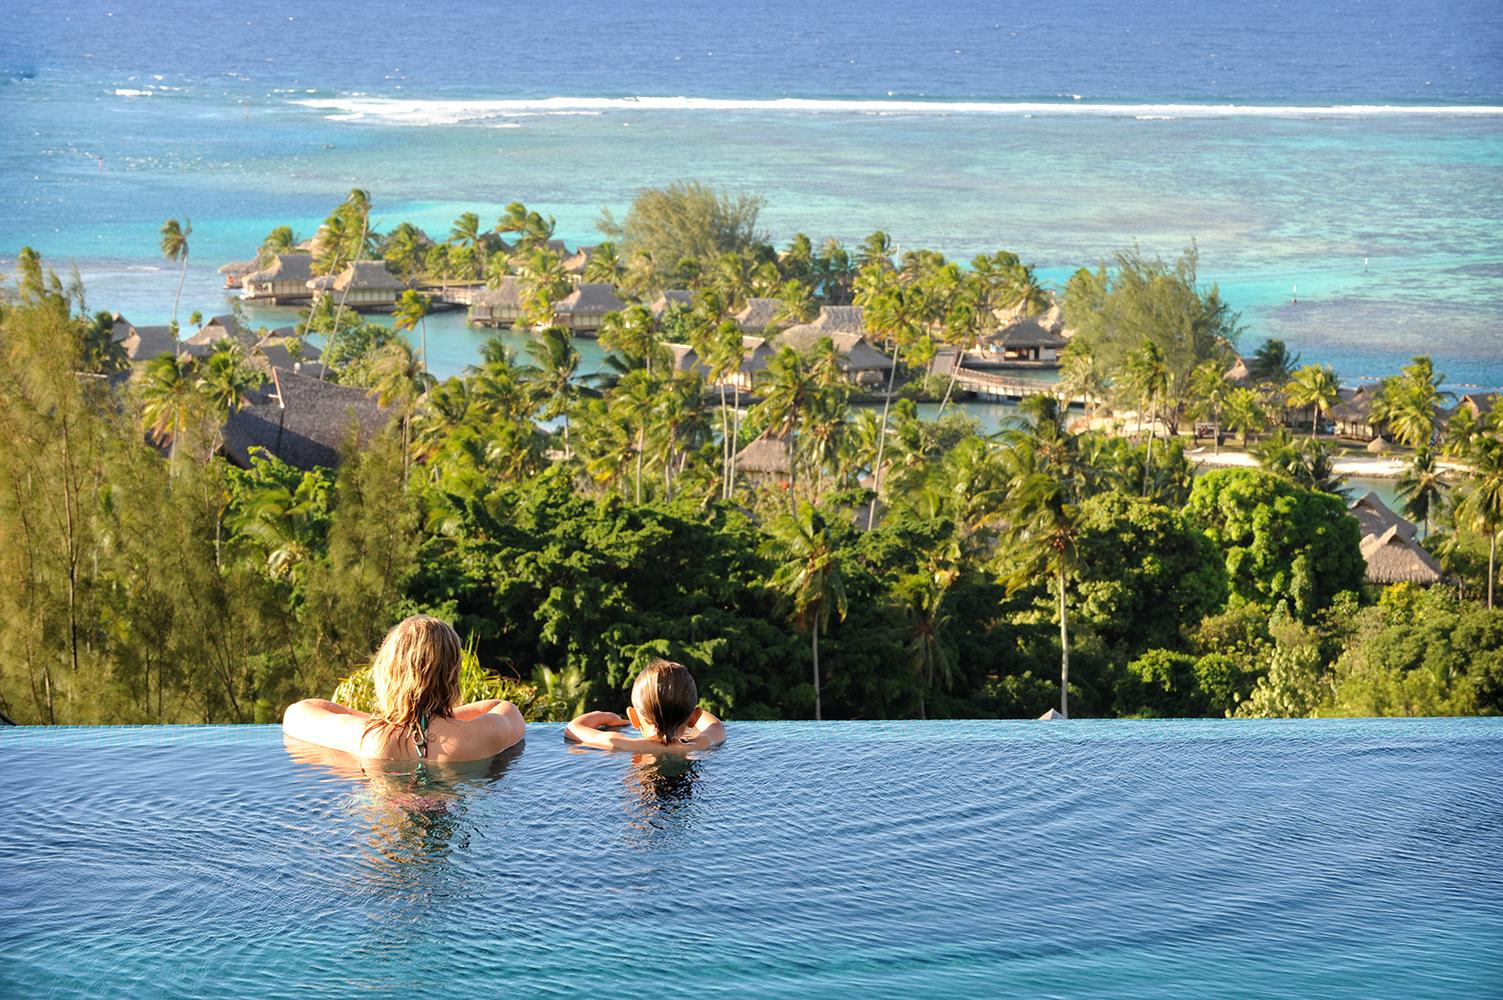 Tahiti, Moorea, Ranskan Polynesia, uima-allas, Tyyni Valtameri